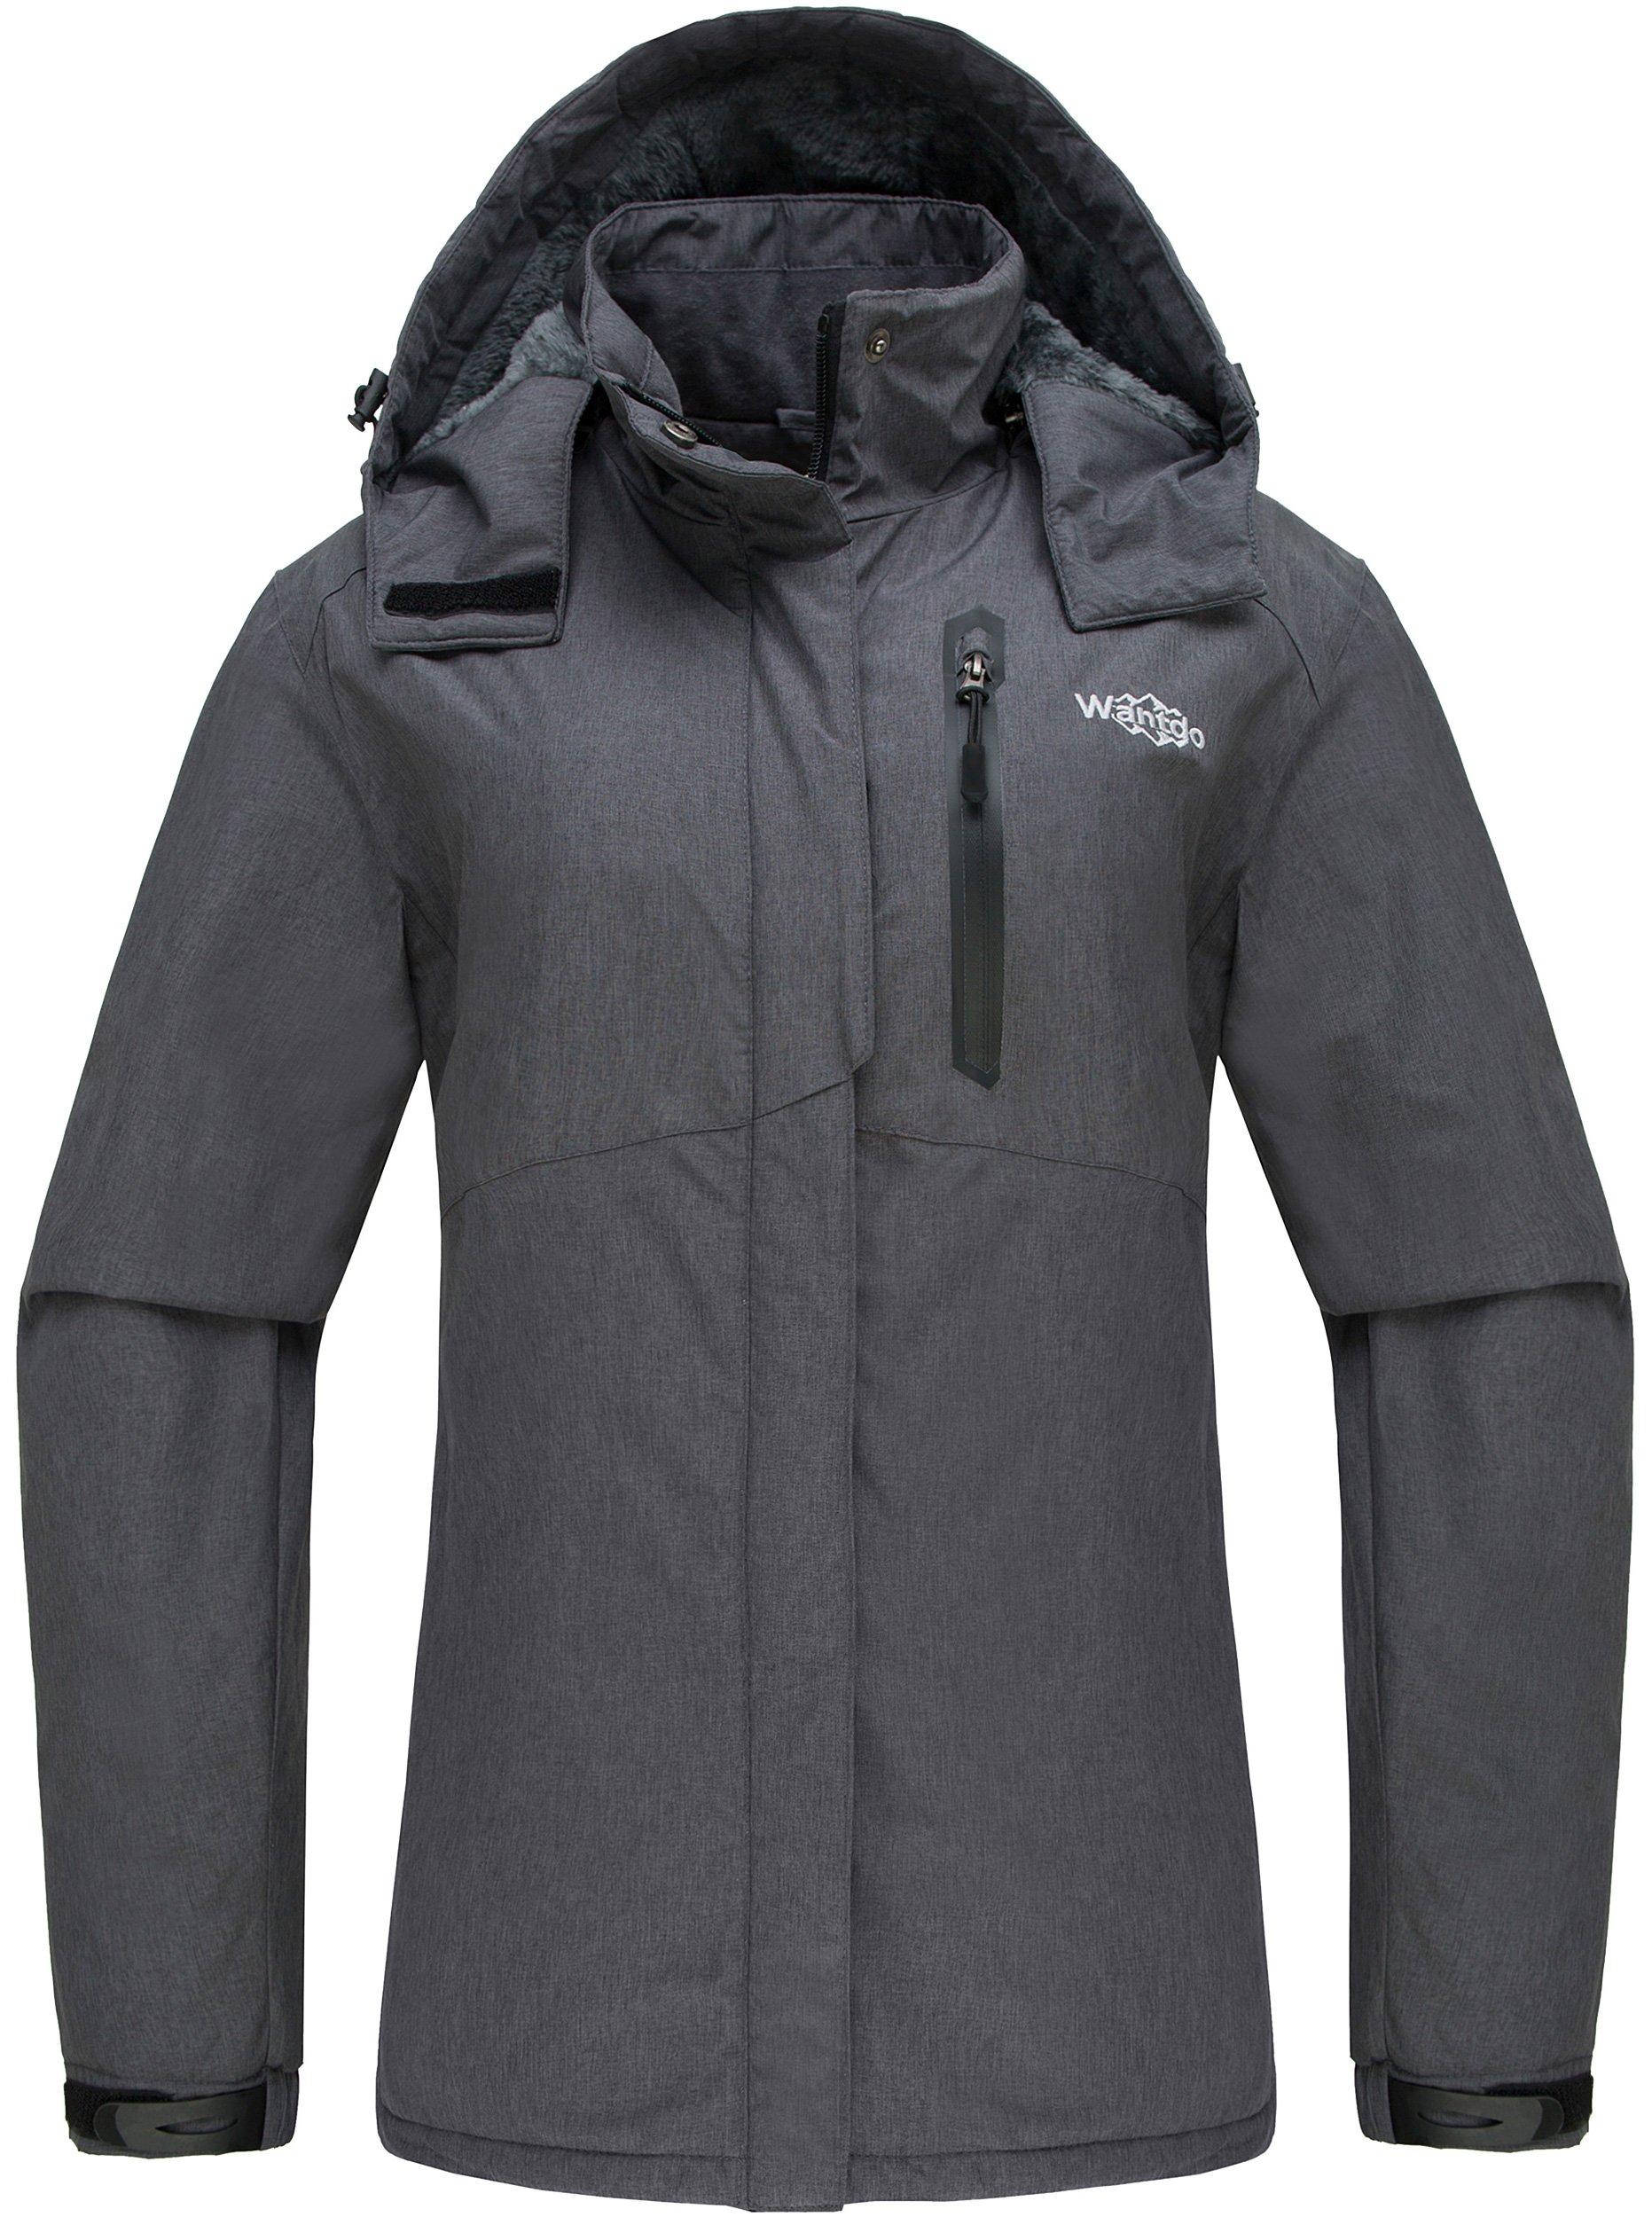 Wantdo Women's Detachable Hood Waterproof Fleece Lined Parka Windproof Ski Jacket Grey US Medium